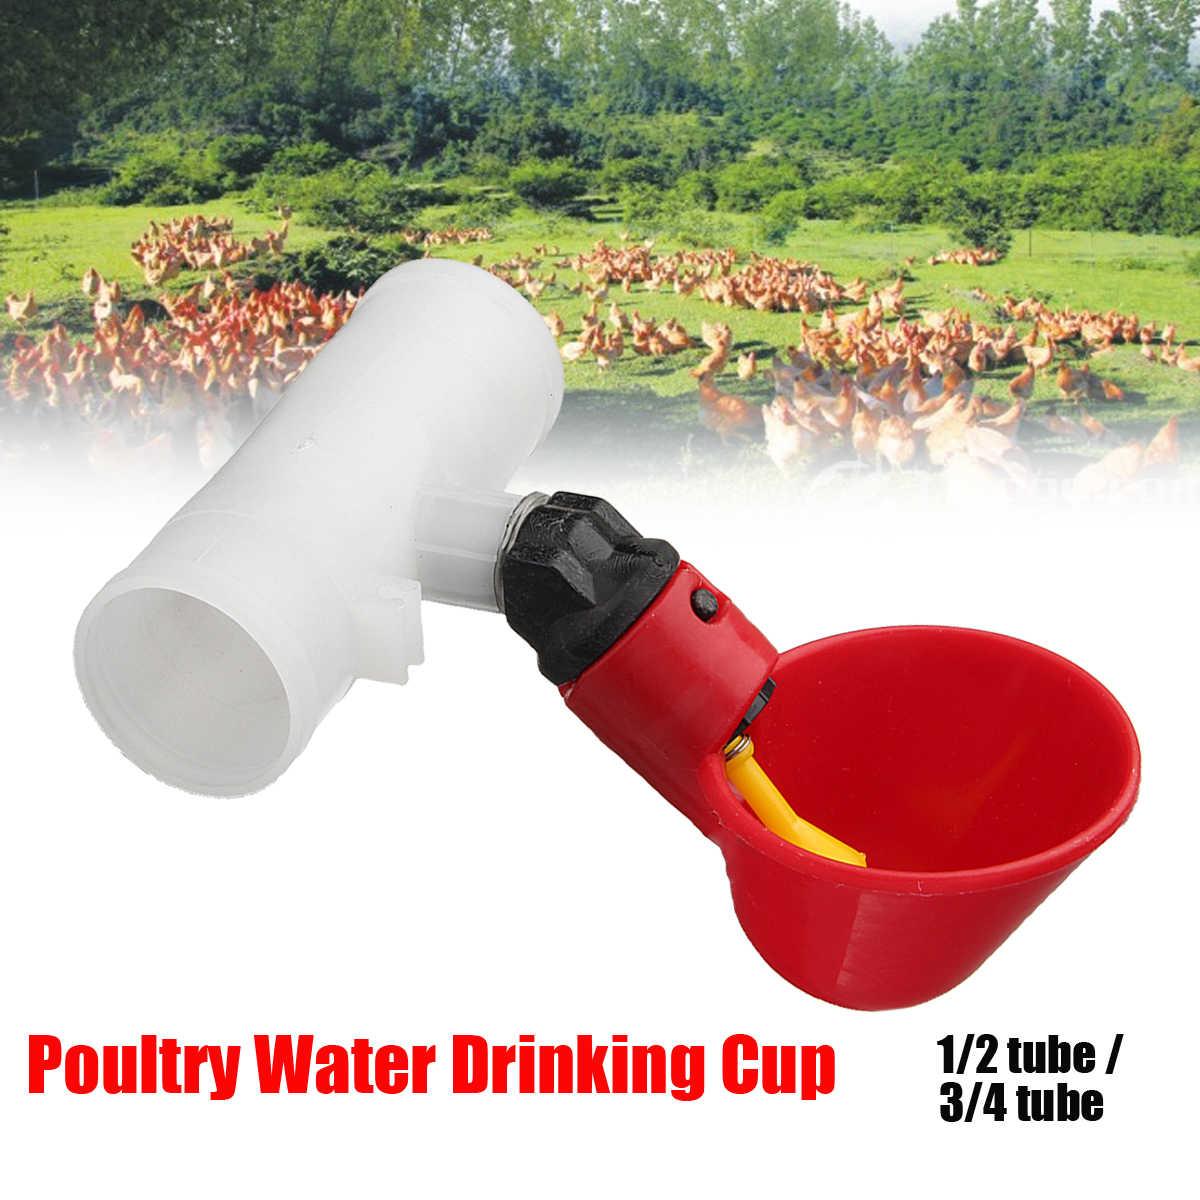 4/' Poultry Water Drinking Tube Plastic Automatically Drinker Chicken Bird Feeder